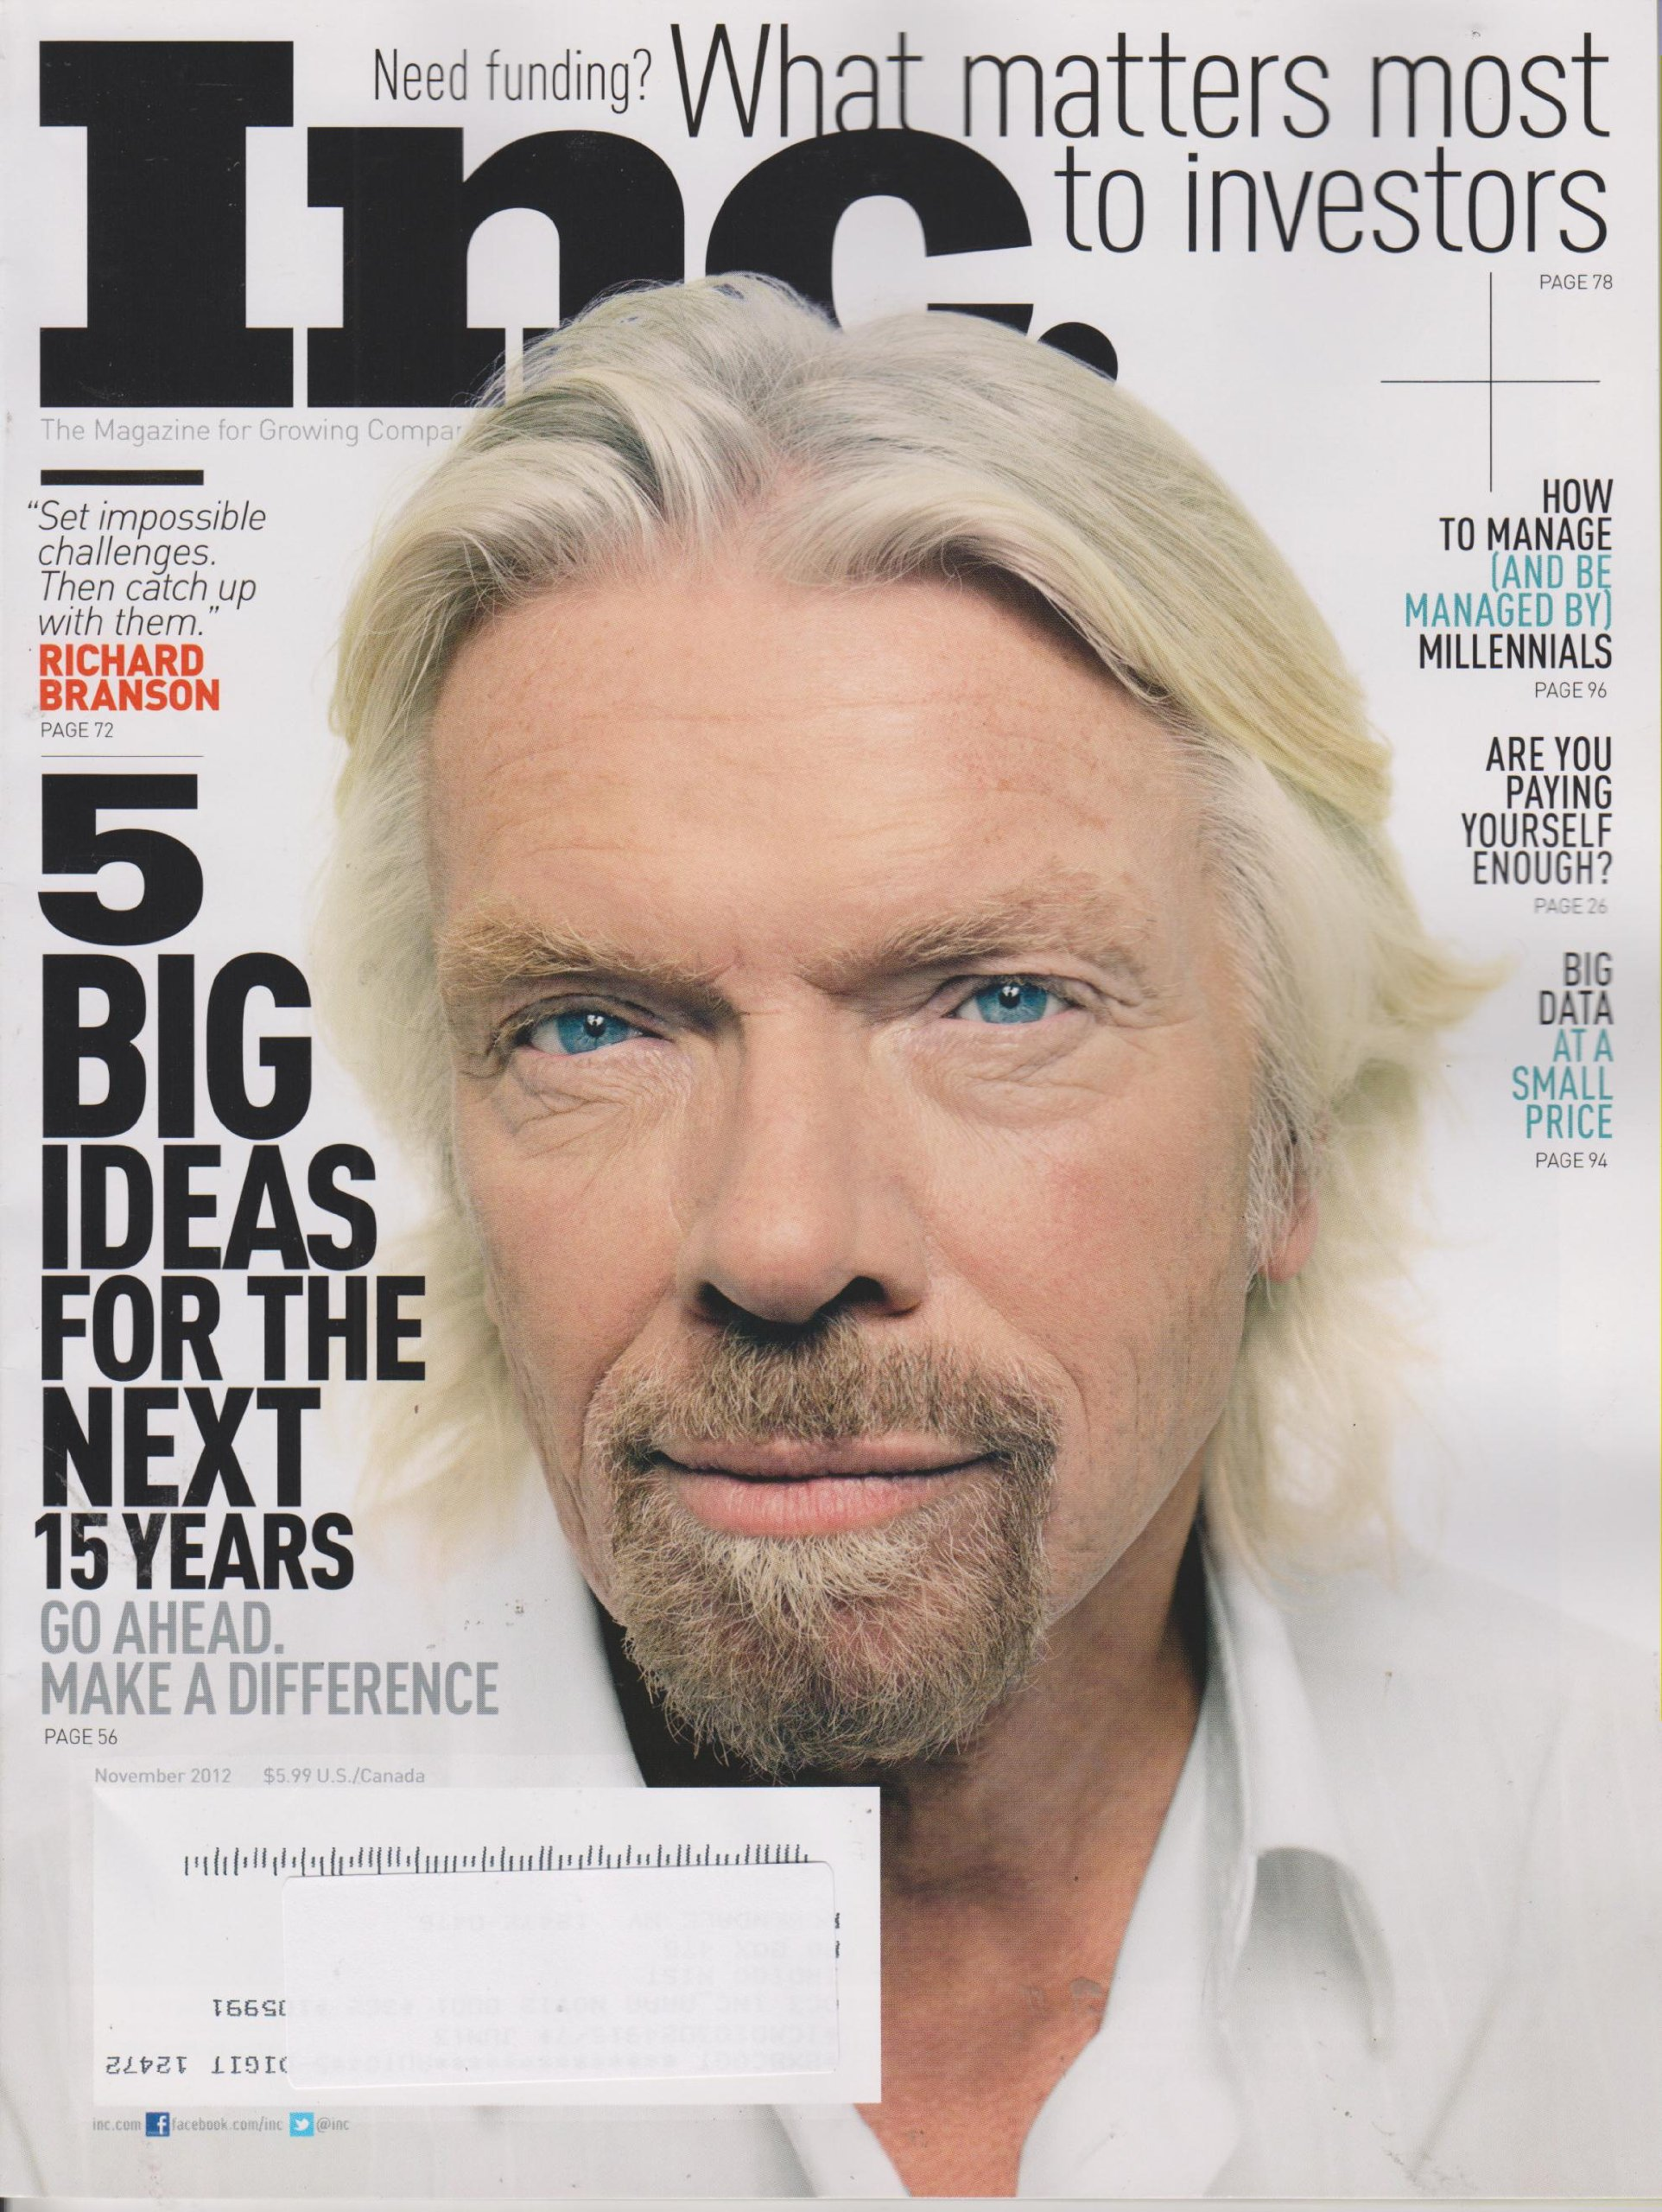 INC November 2012 Richard Branson 5 Big Ideas For The Next 15 Years